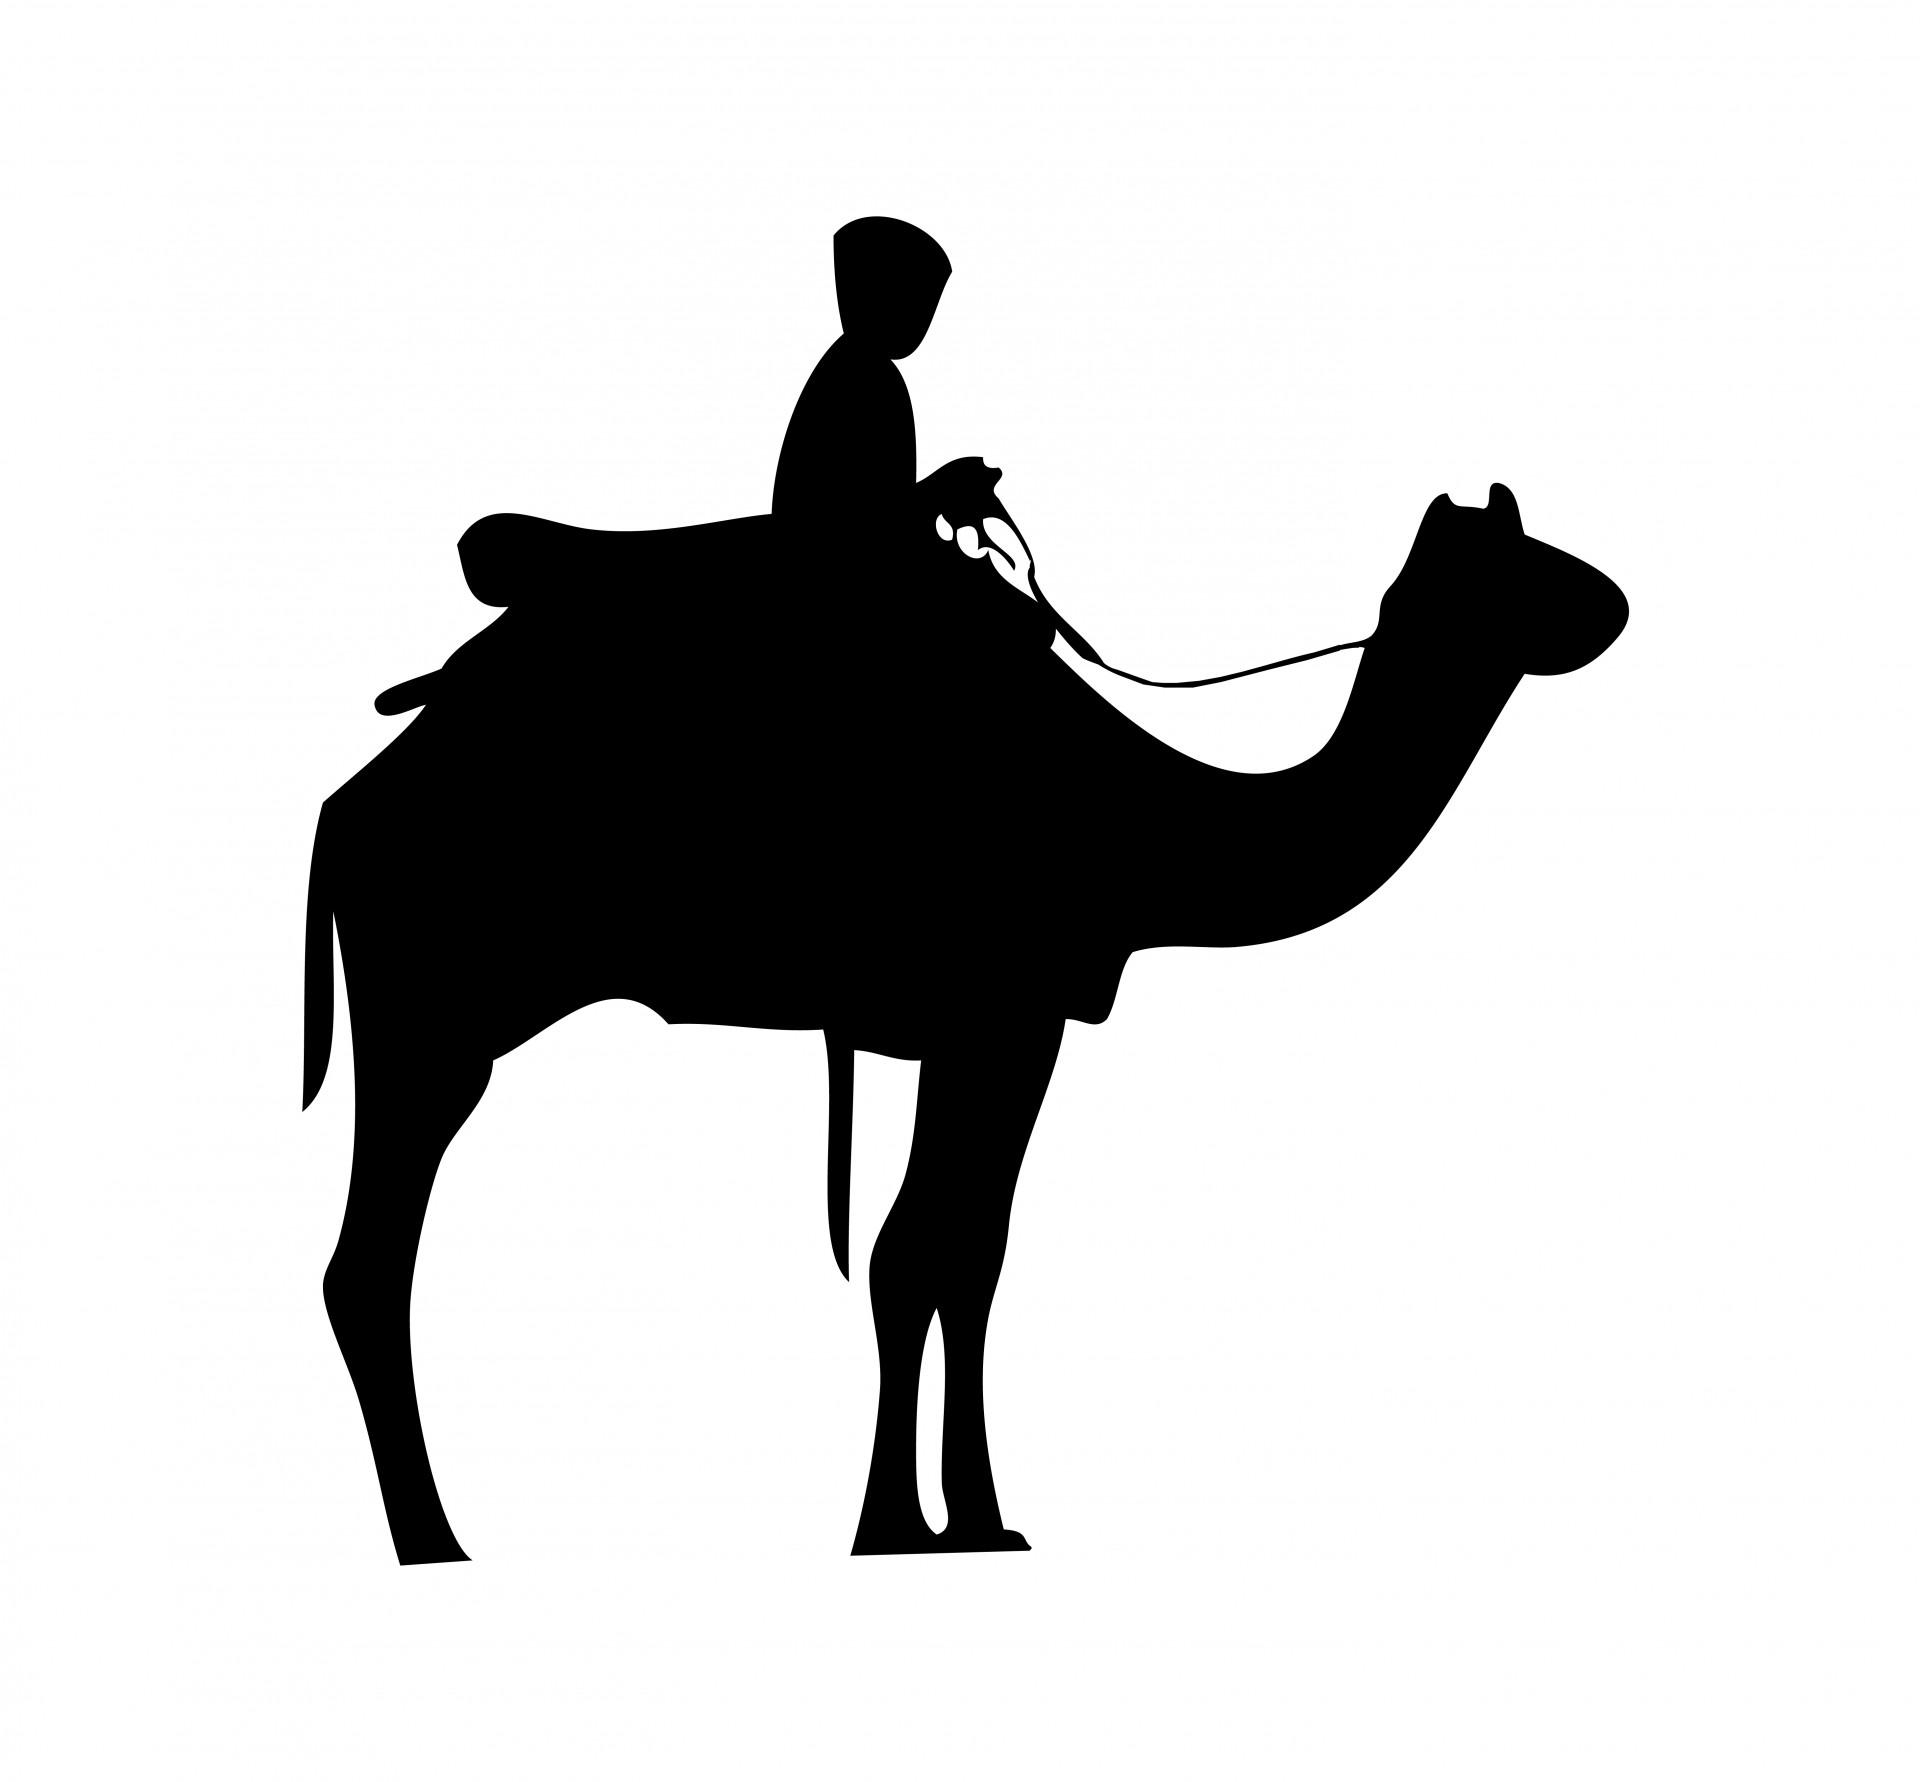 Camel Caravan clipart silhouette Clipart Back Rider Public Silhouette